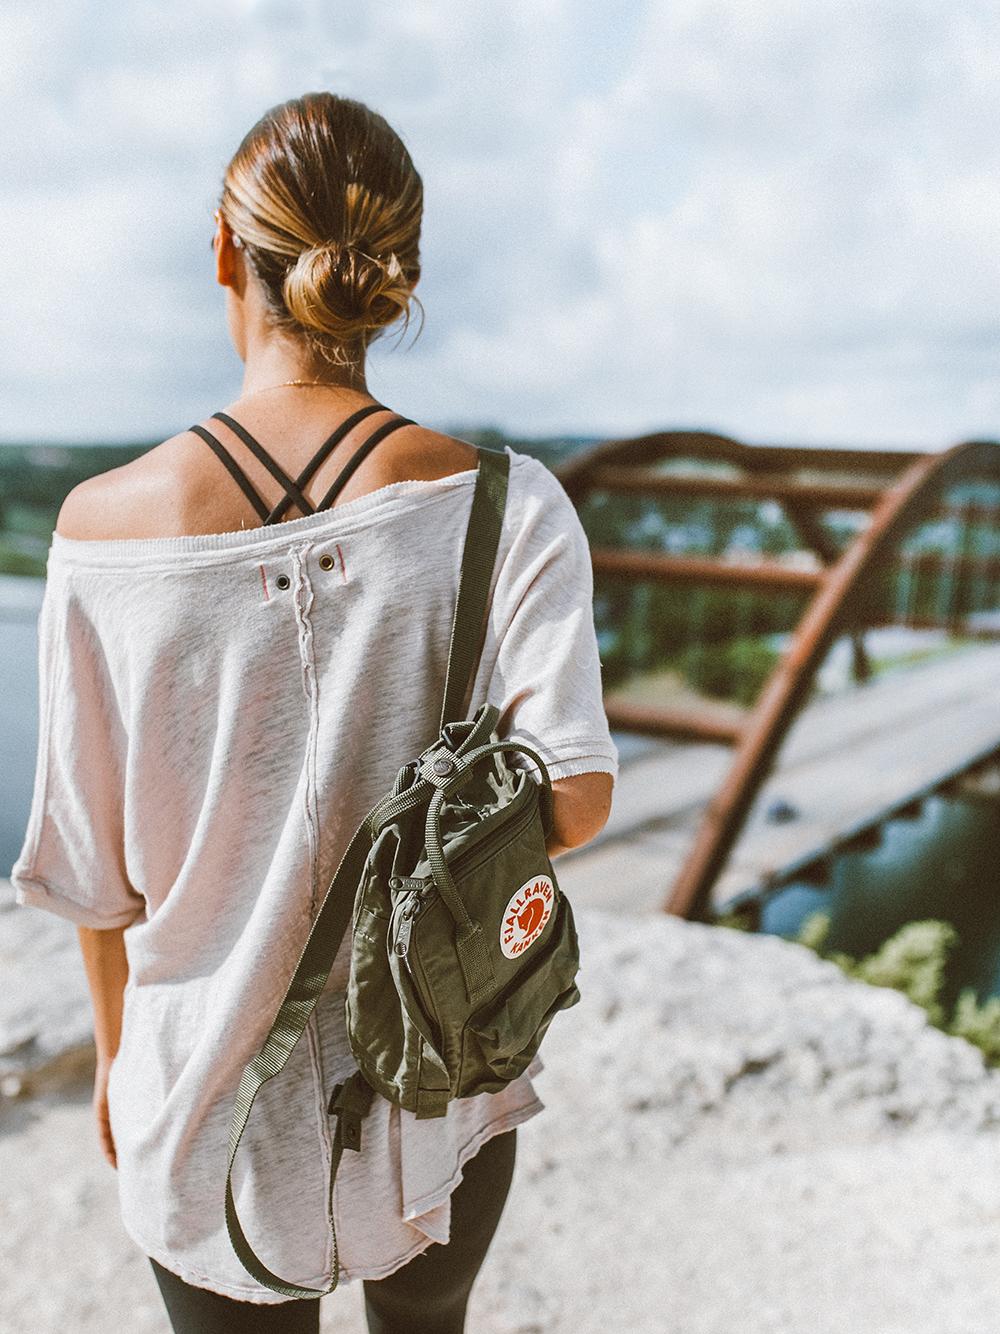 livvyland-blog-olivia-watson-backcountry-free-people-take-me-tee-fjallraven-kanken-mini-green-backpack-360-overlook-bridge-3